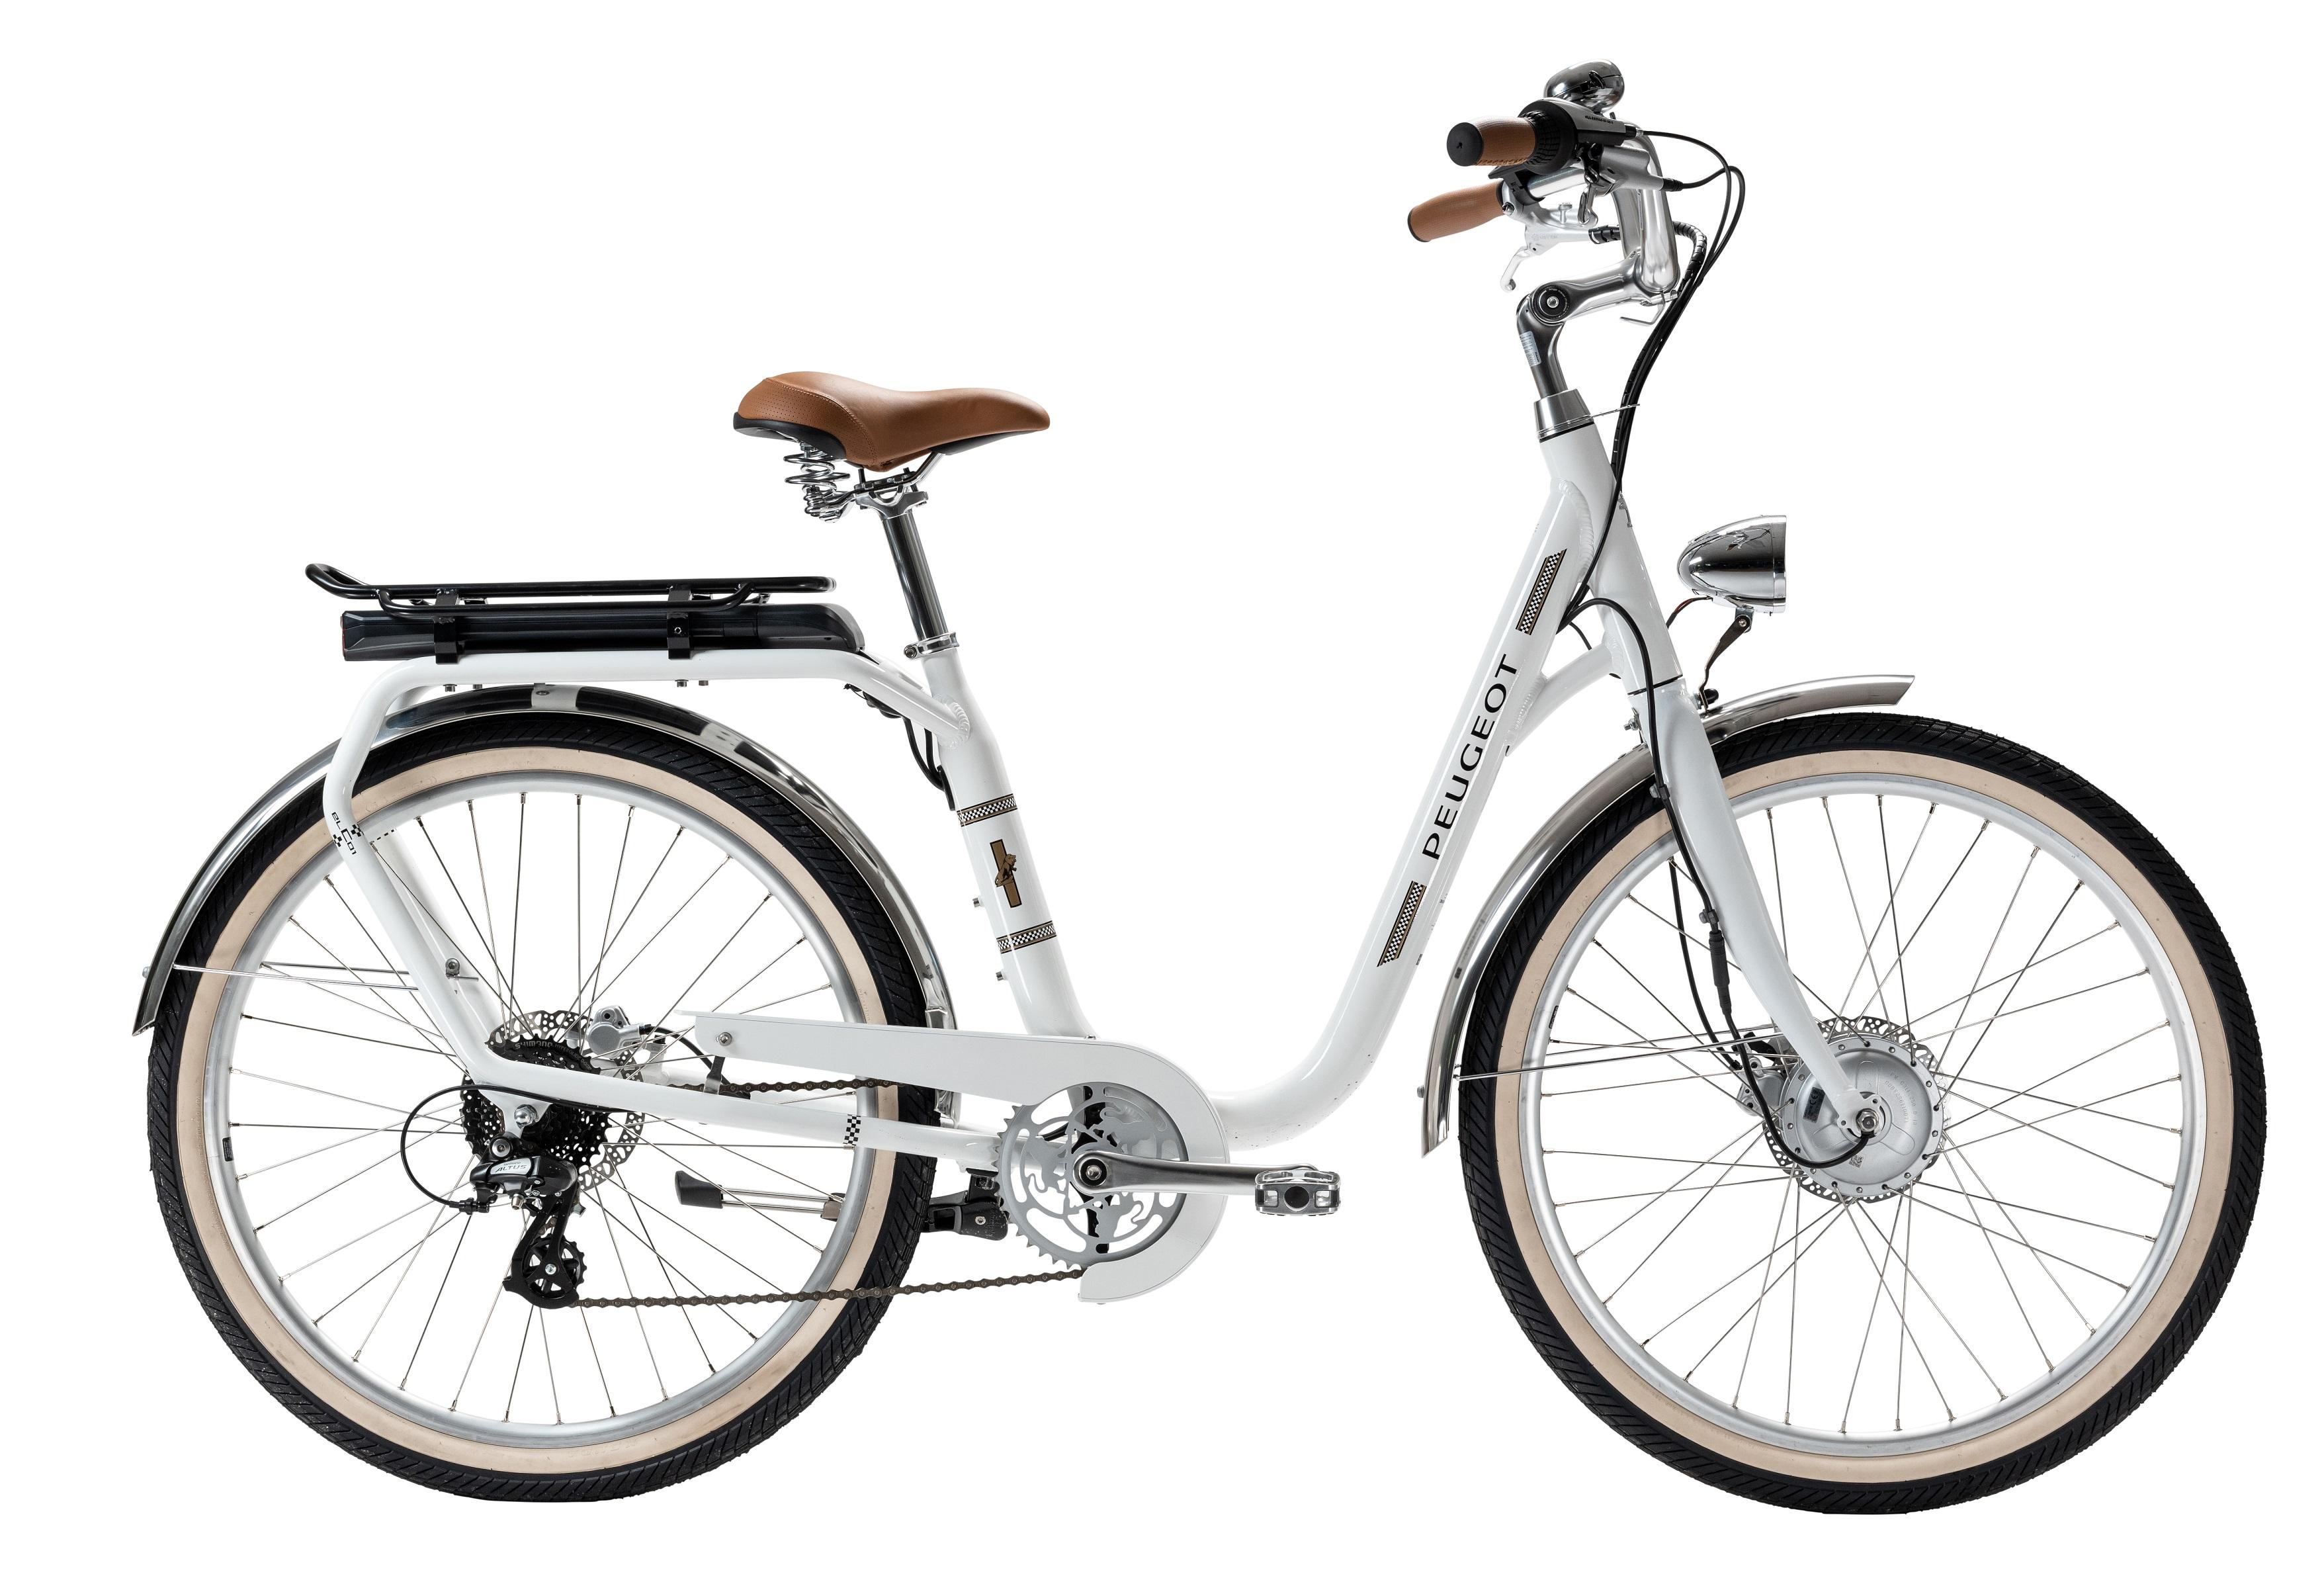 Peugeot lança bicicleta elétrica que garante estilo néo-retro